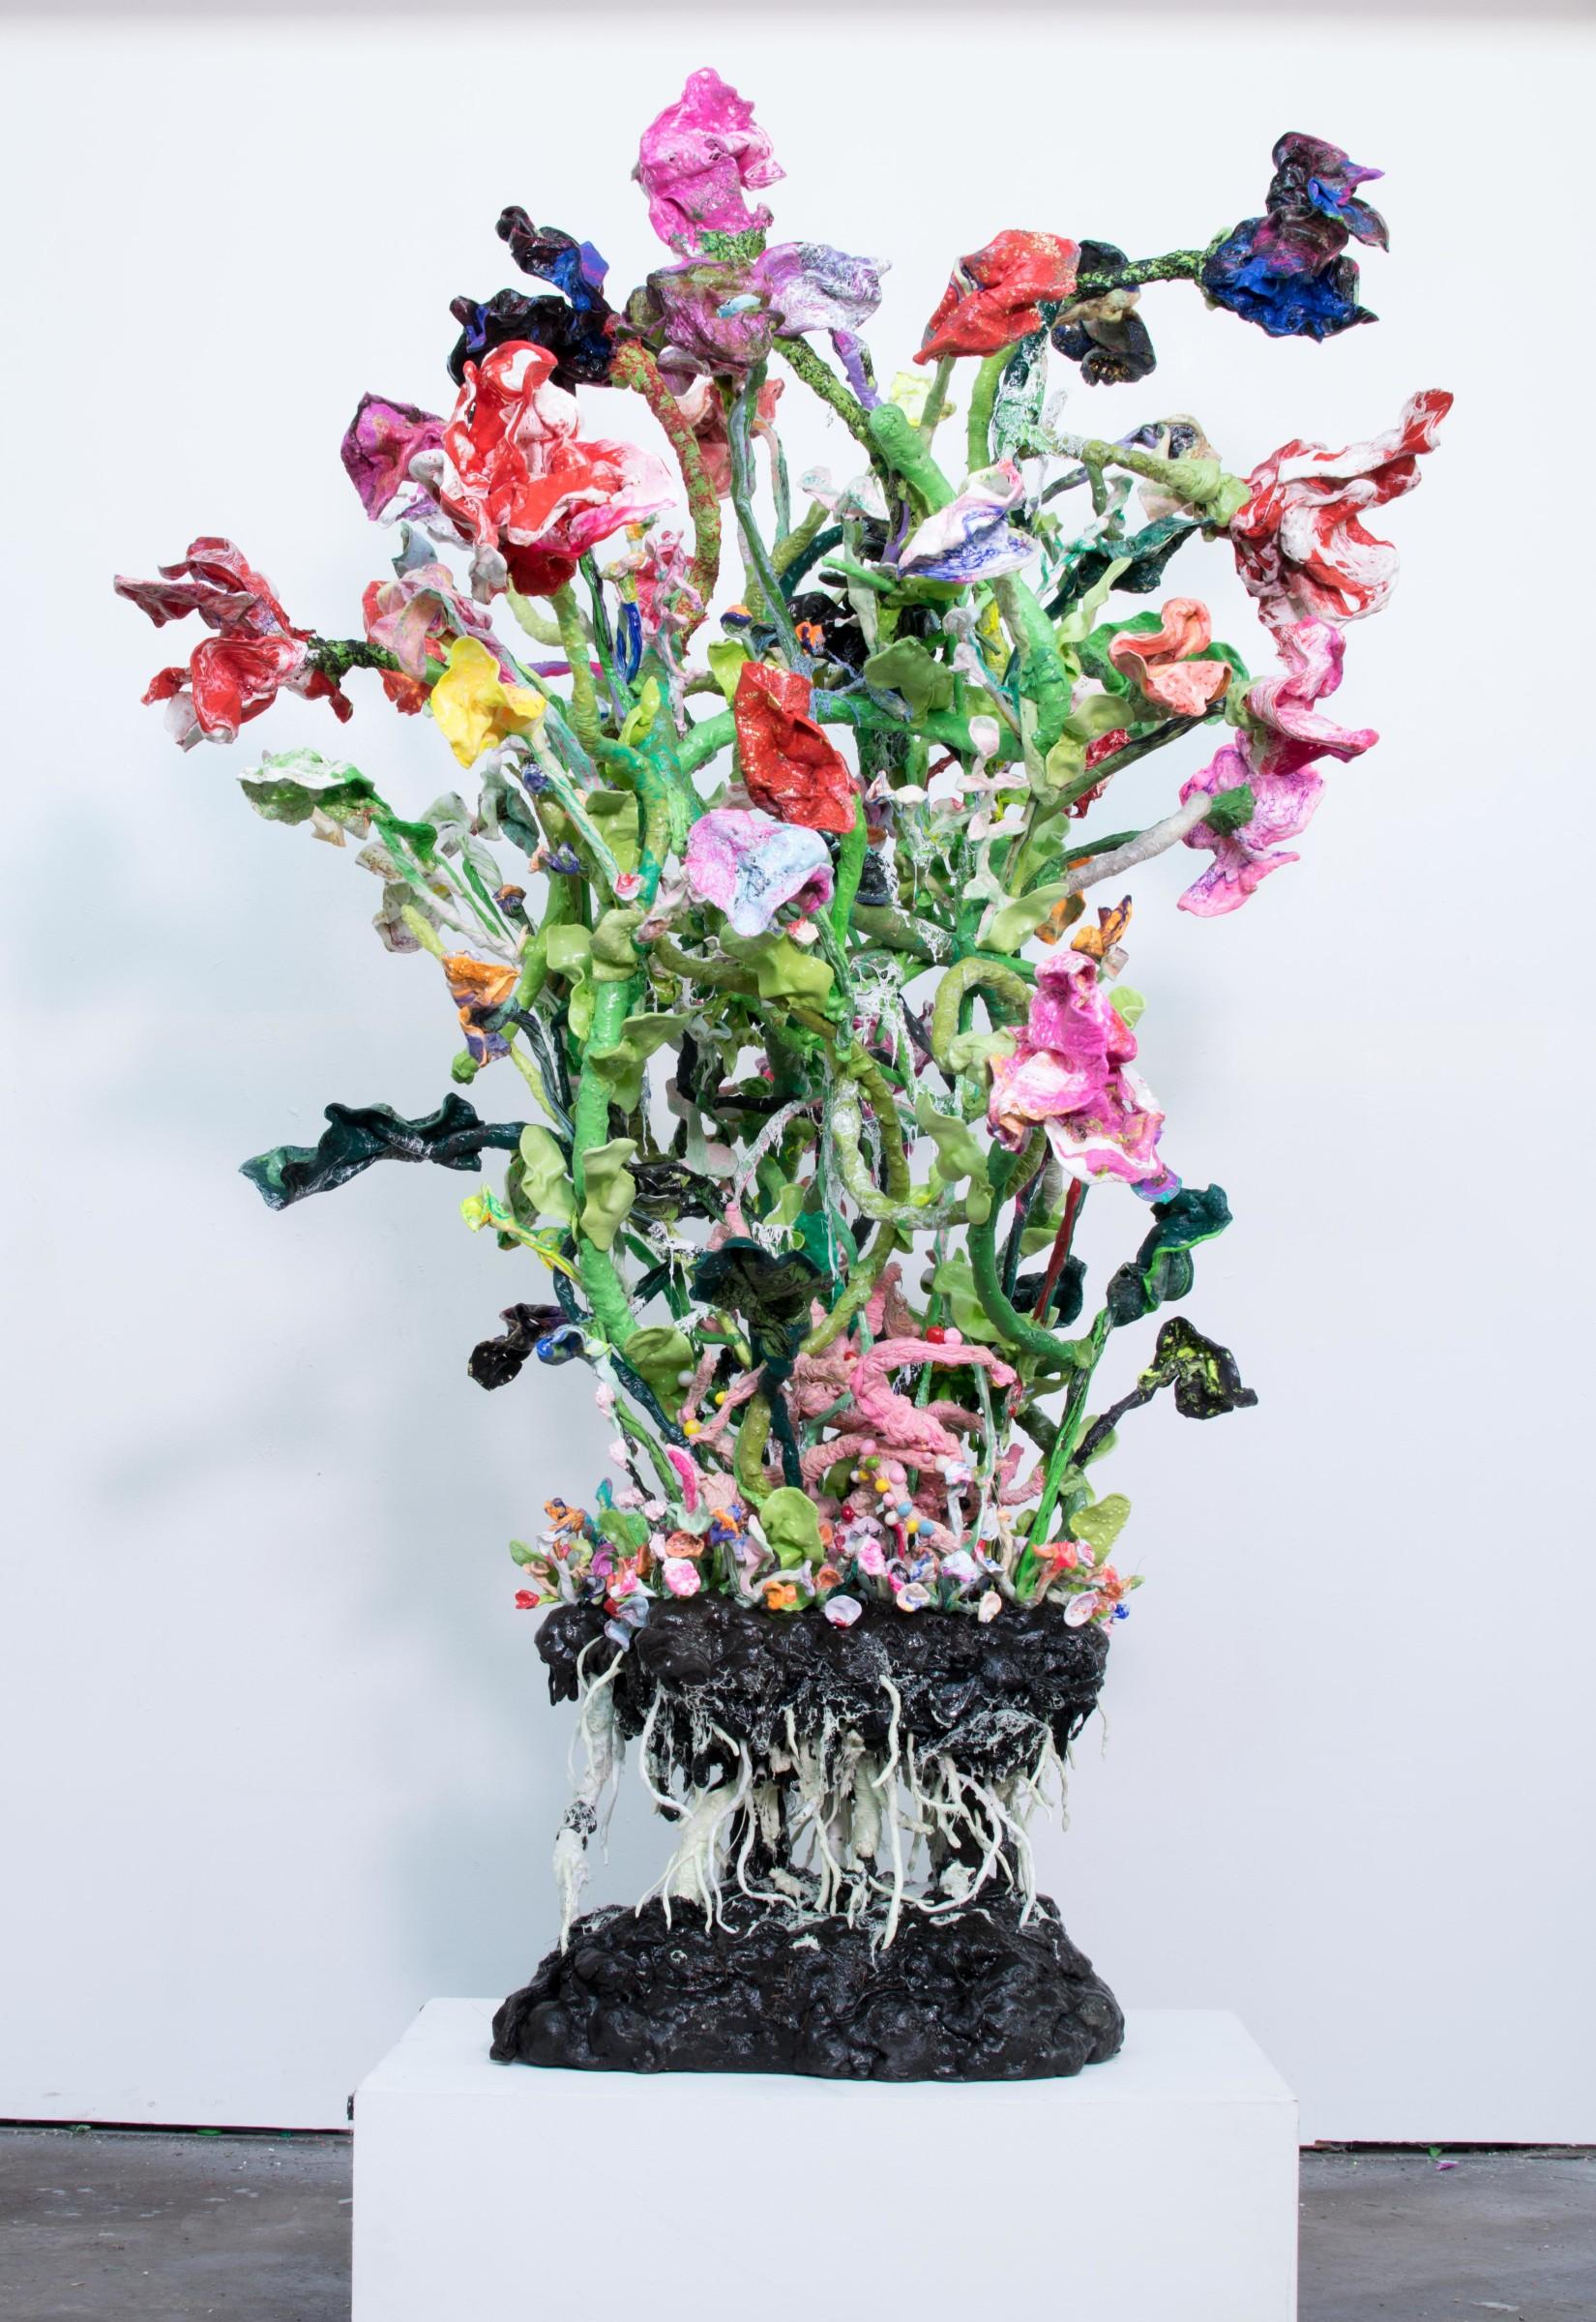 "<span class=""link fancybox-details-link""><a href=""/artists/42-stefan-gross/works/5031-stefan-gross-stranger-flowers-vi-2018/"">View Detail Page</a></span><div class=""artist""><strong>Stefan Gross</strong></div> <div class=""title""><em>Stranger Flowers - VI</em>, 2018</div> <div class=""medium"">Oil Plastic<br /> <br /> Unicum</div> <div class=""dimensions"">220 x 100 x 100 cm</div><div class=""price"">€25,000.00</div>"